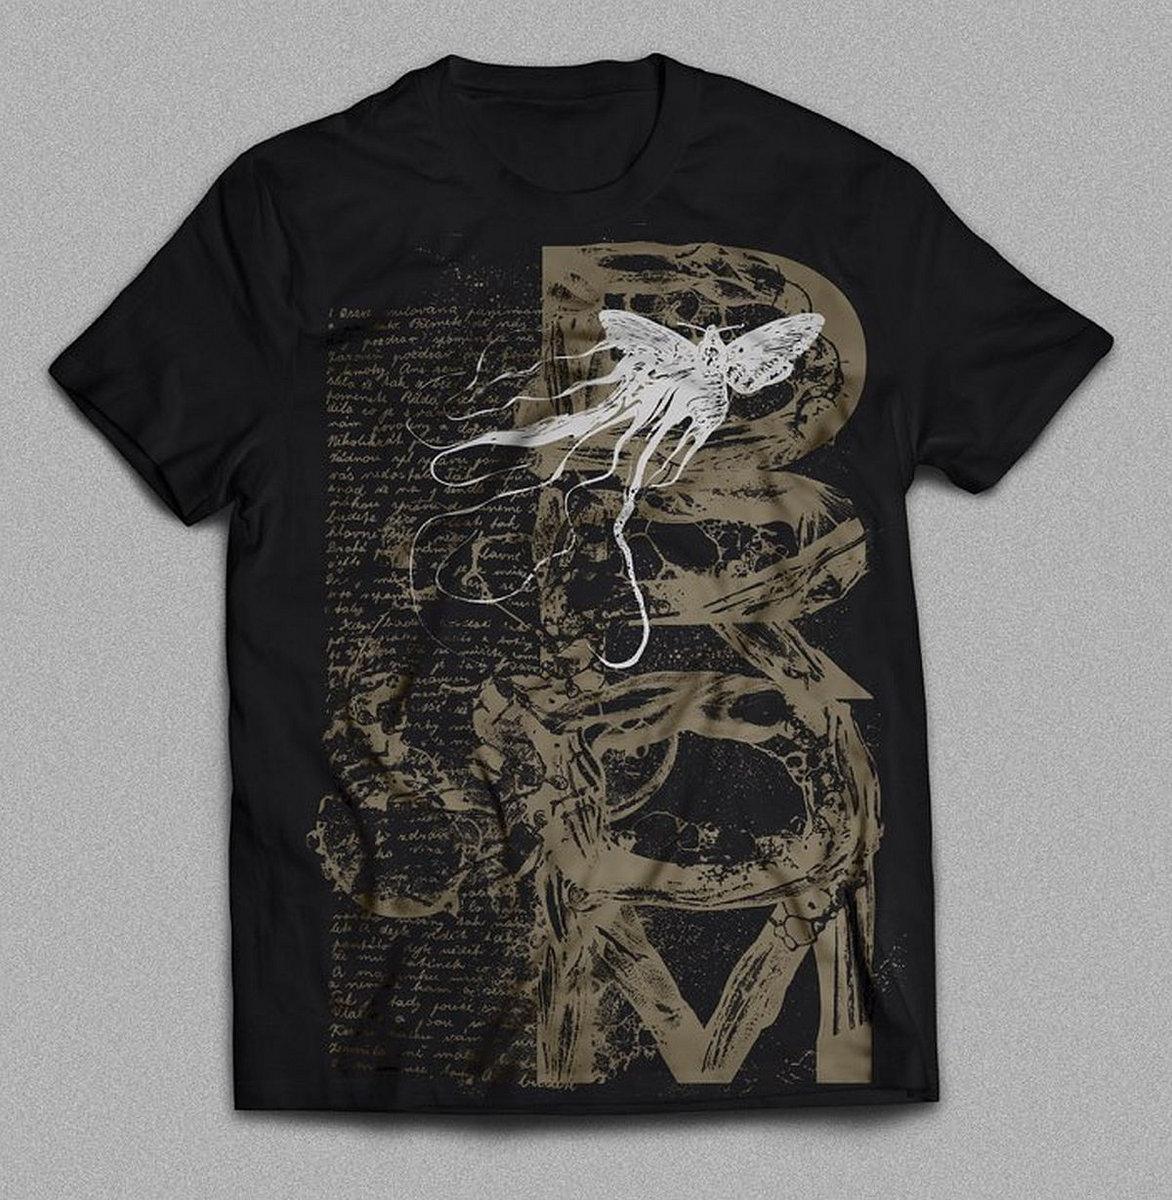 T Shirt Design Software Free Download Agbu Hye Geen